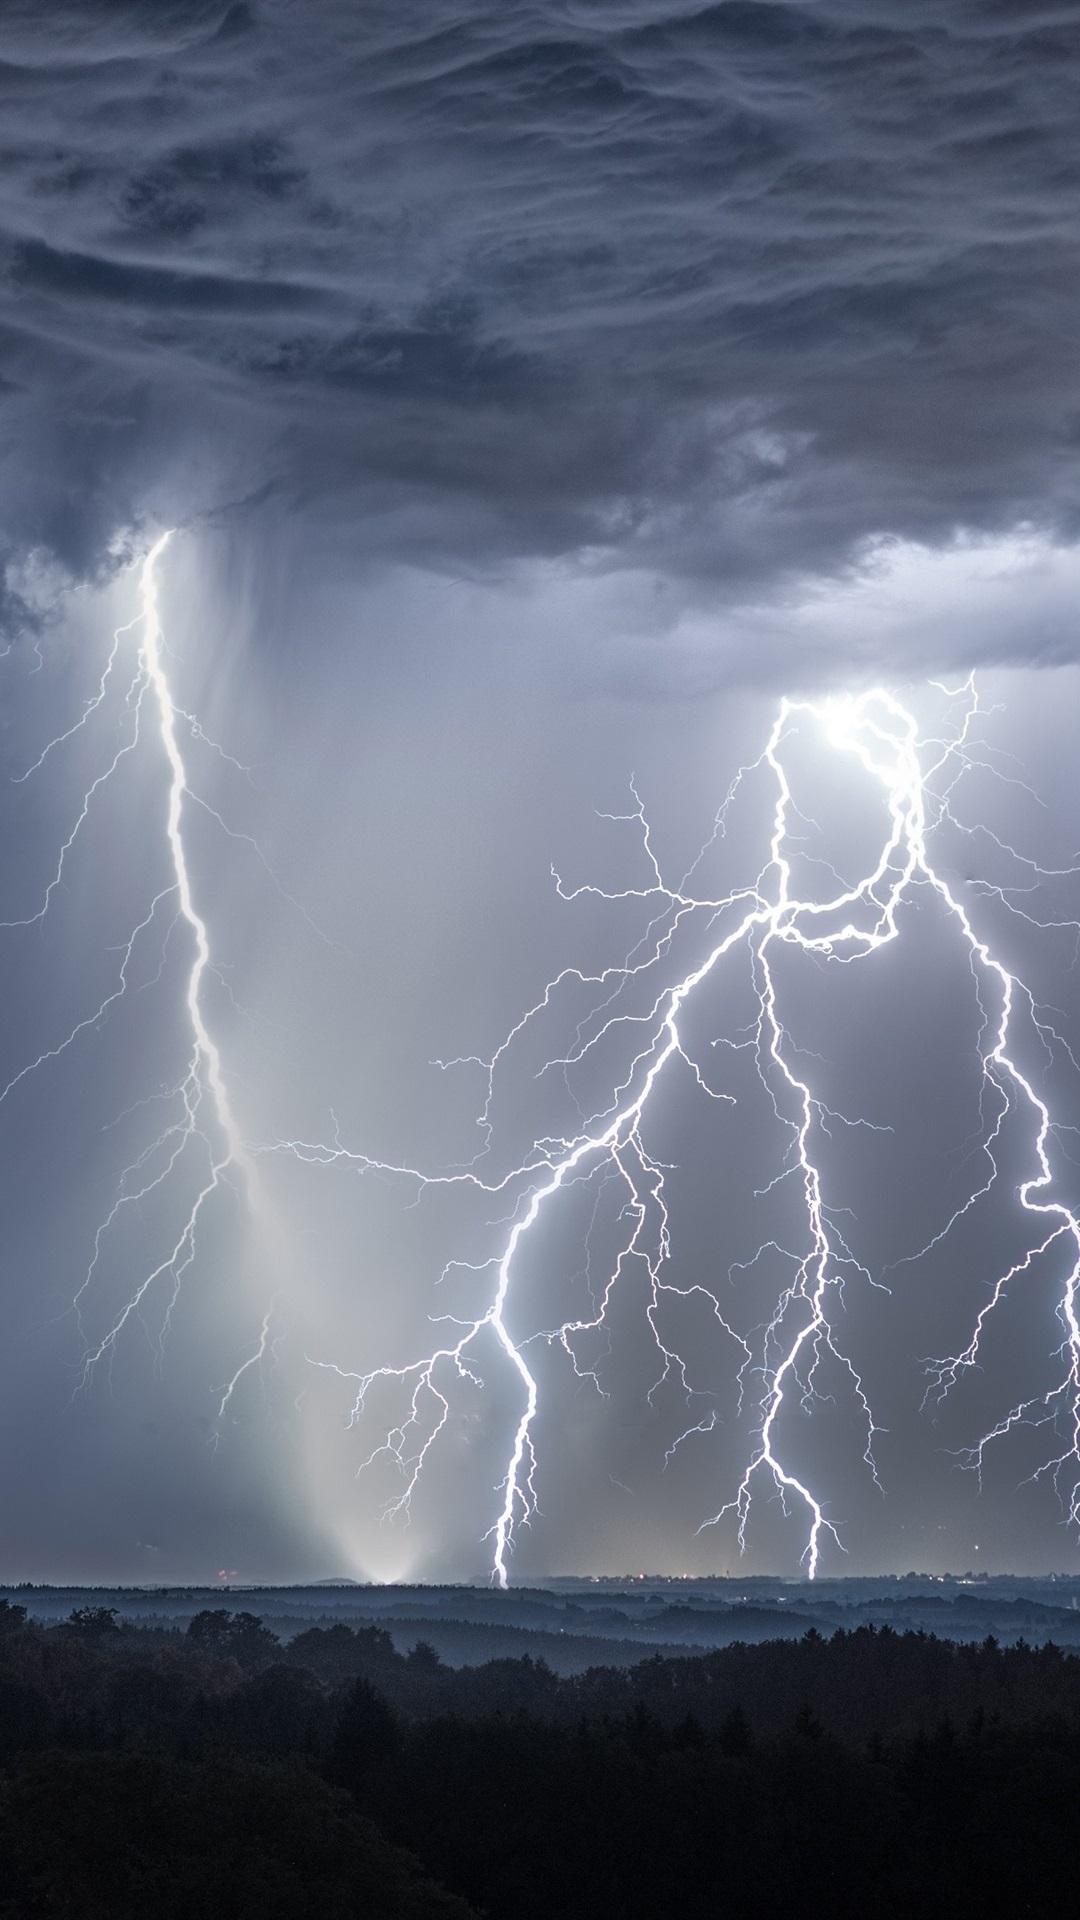 Wallpaper Storm Lightning Clouds Germany 3840x2160 Uhd